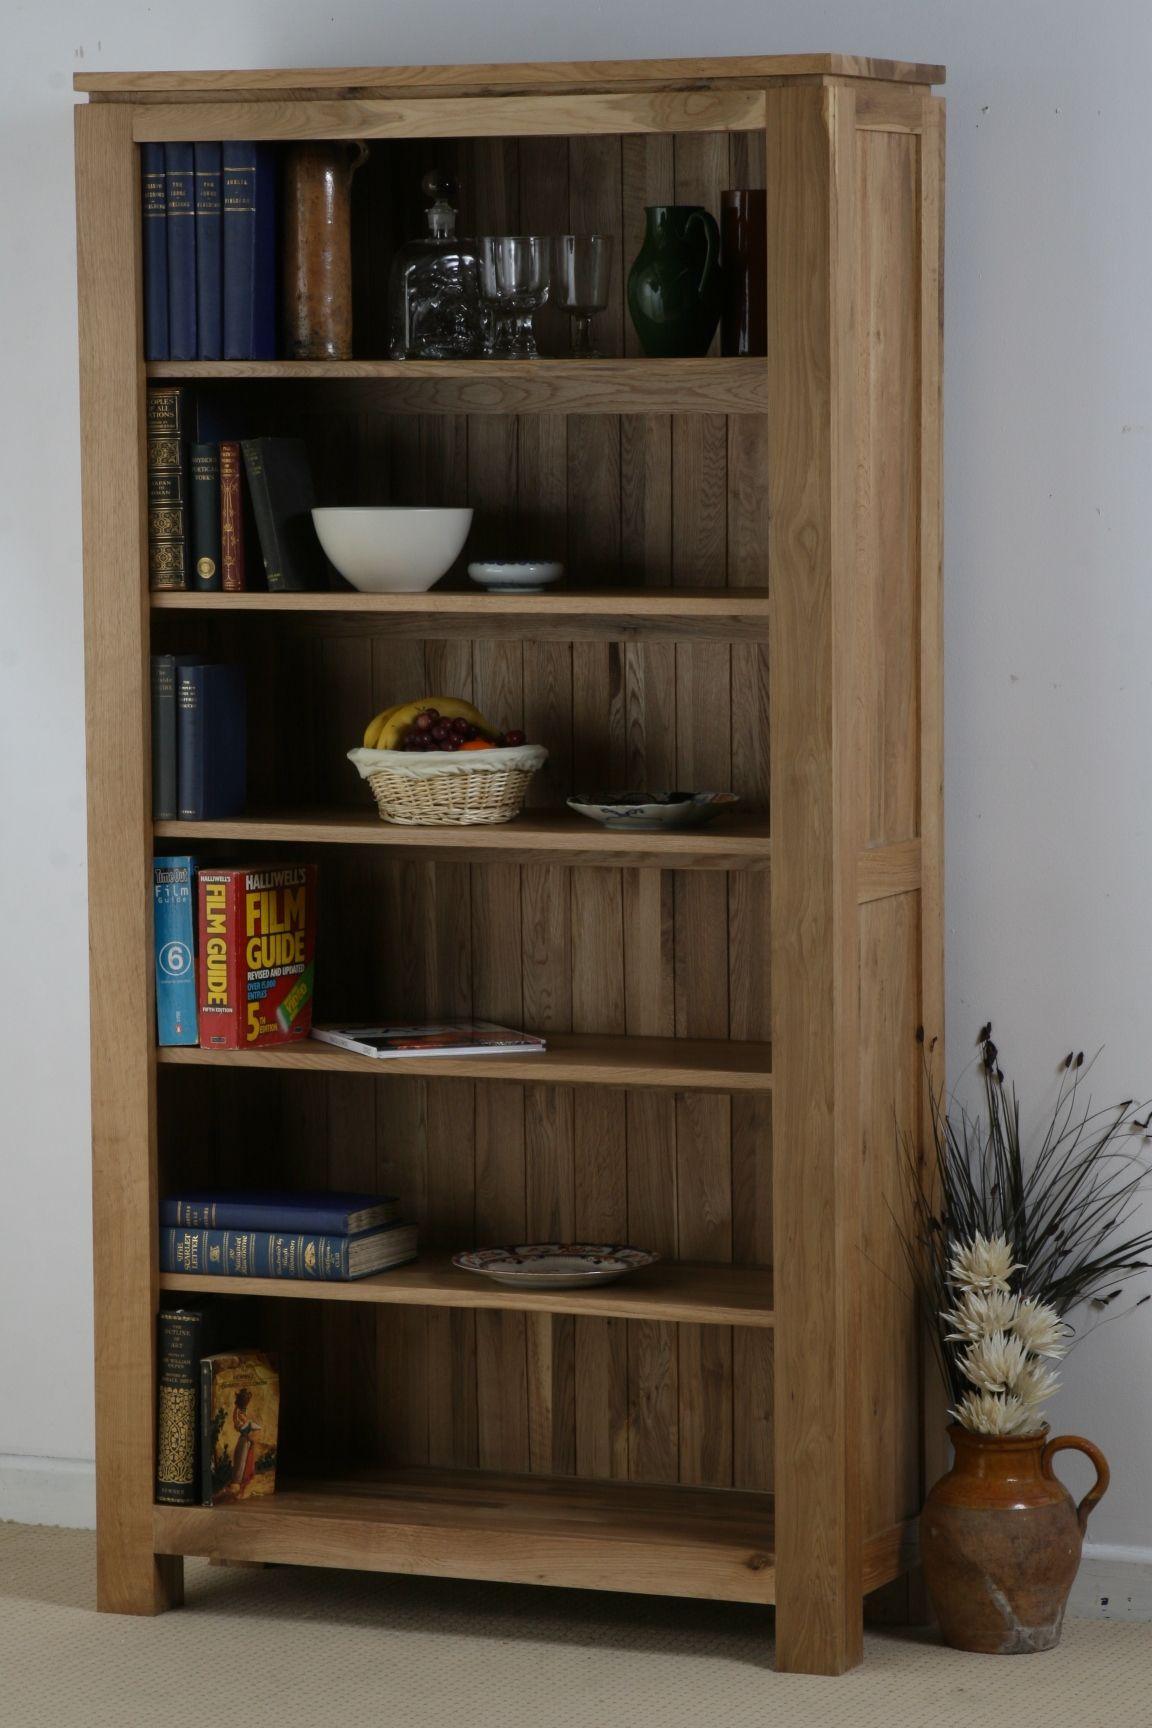 Office furniture galway - 17 Best Images About Oak Furniture On Pinterest Oak Cabinets Solid Oak Furniture And Oak Kitchens